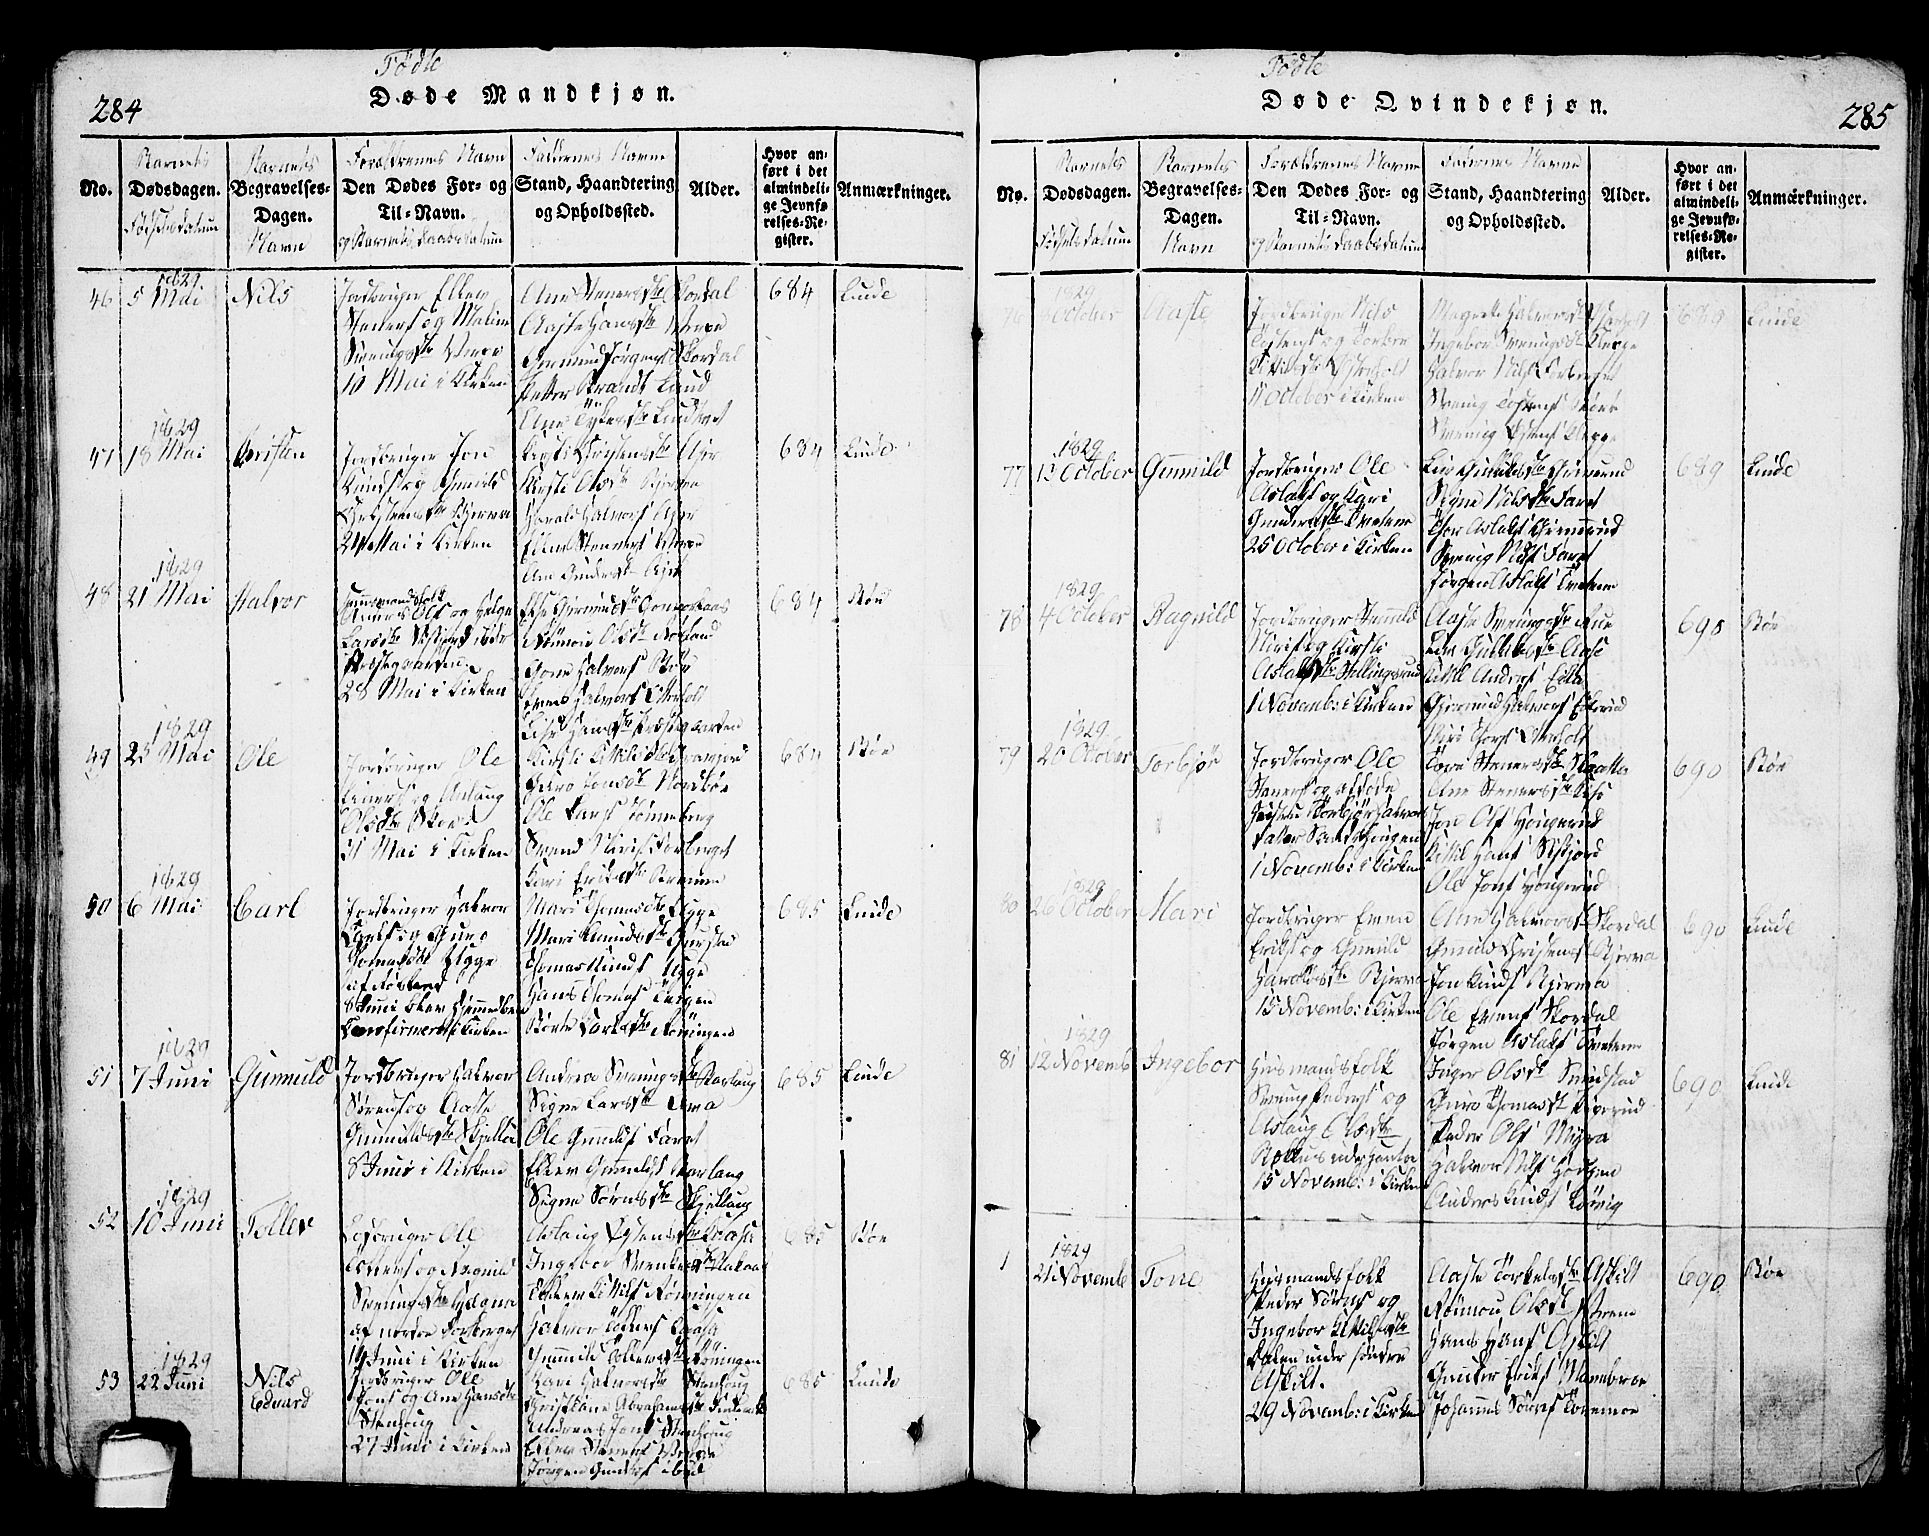 SAKO, Bø kirkebøker, G/Ga/L0001: Klokkerbok nr. 1, 1815-1831, s. 284-285